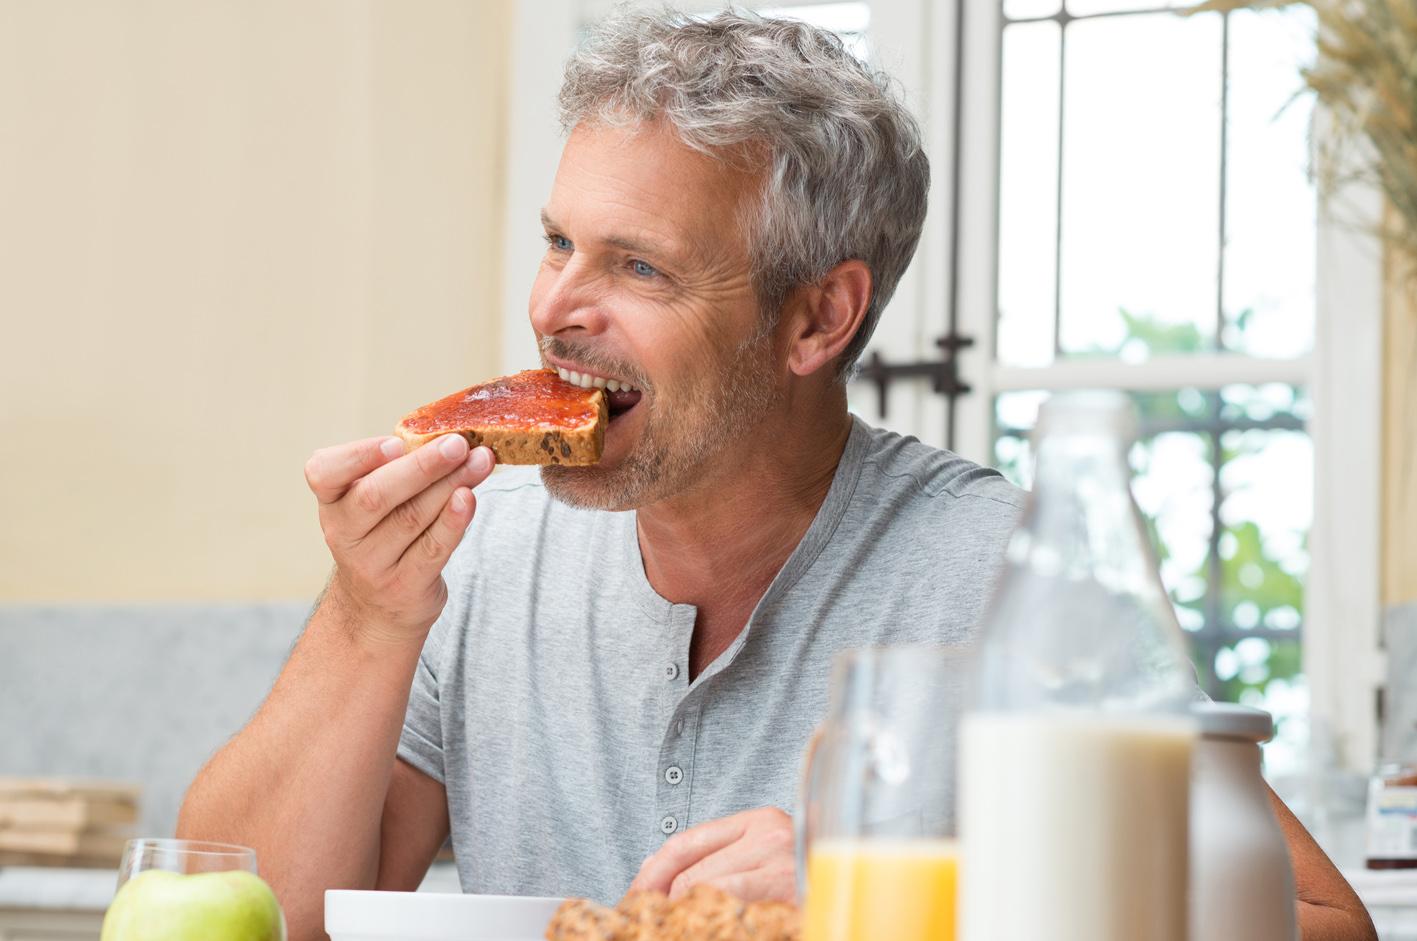 Photo of Roti Bakar Yang Terlebih Dimasak Merupakan Penyebab Kanser?